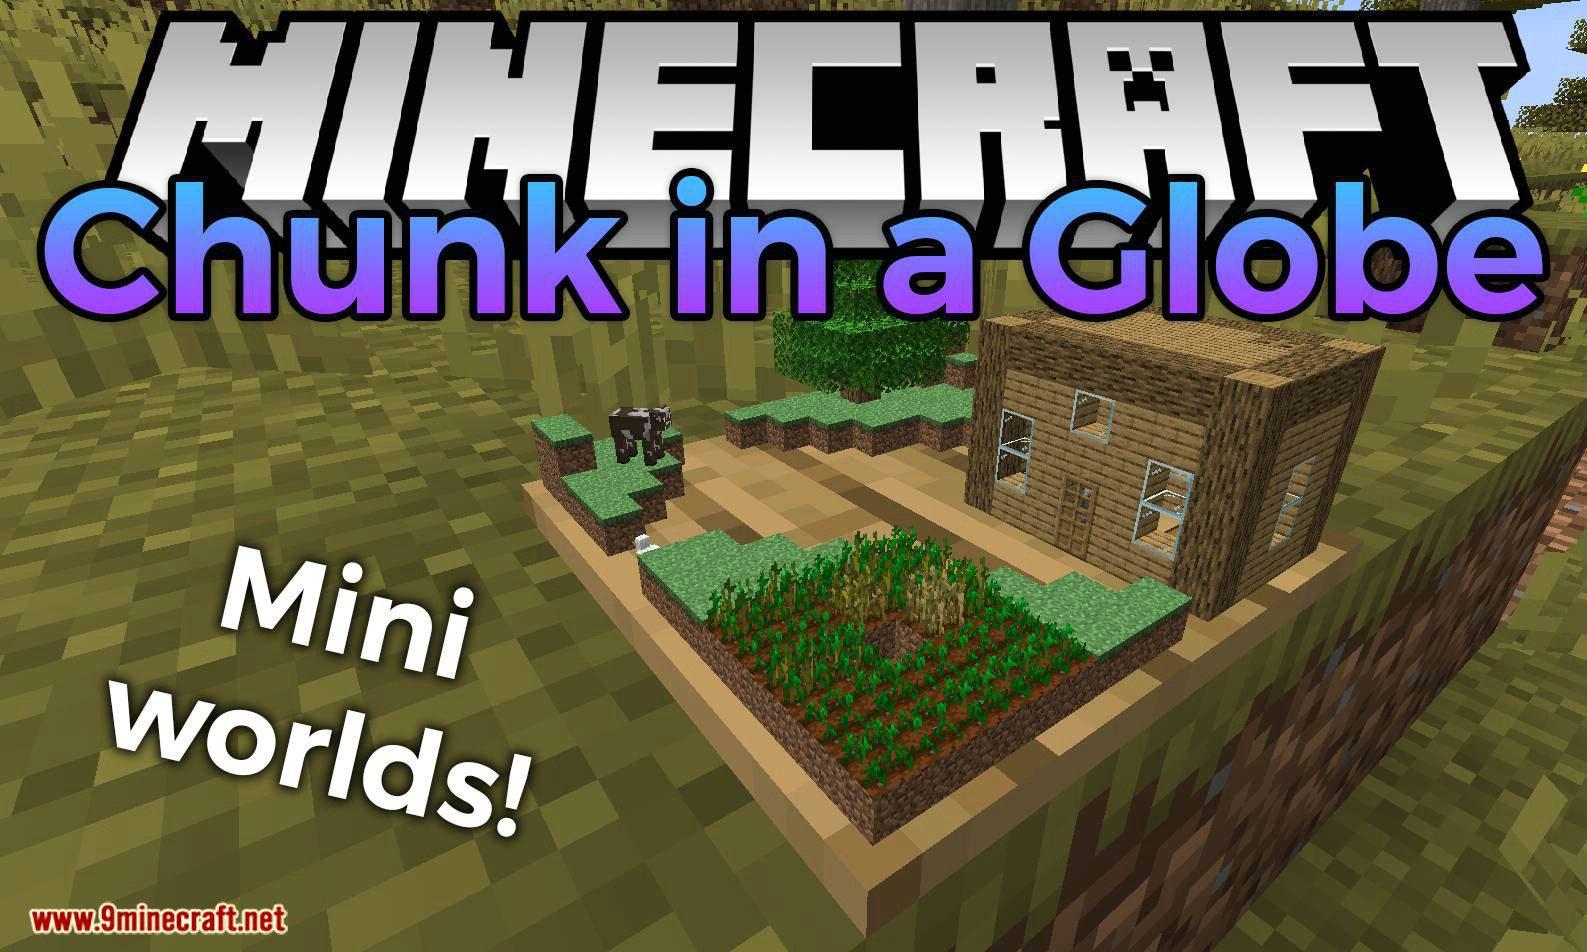 Chunk In A Globe Mod 1 15 2 (Real Mini Worlds) 9Minecraft Net